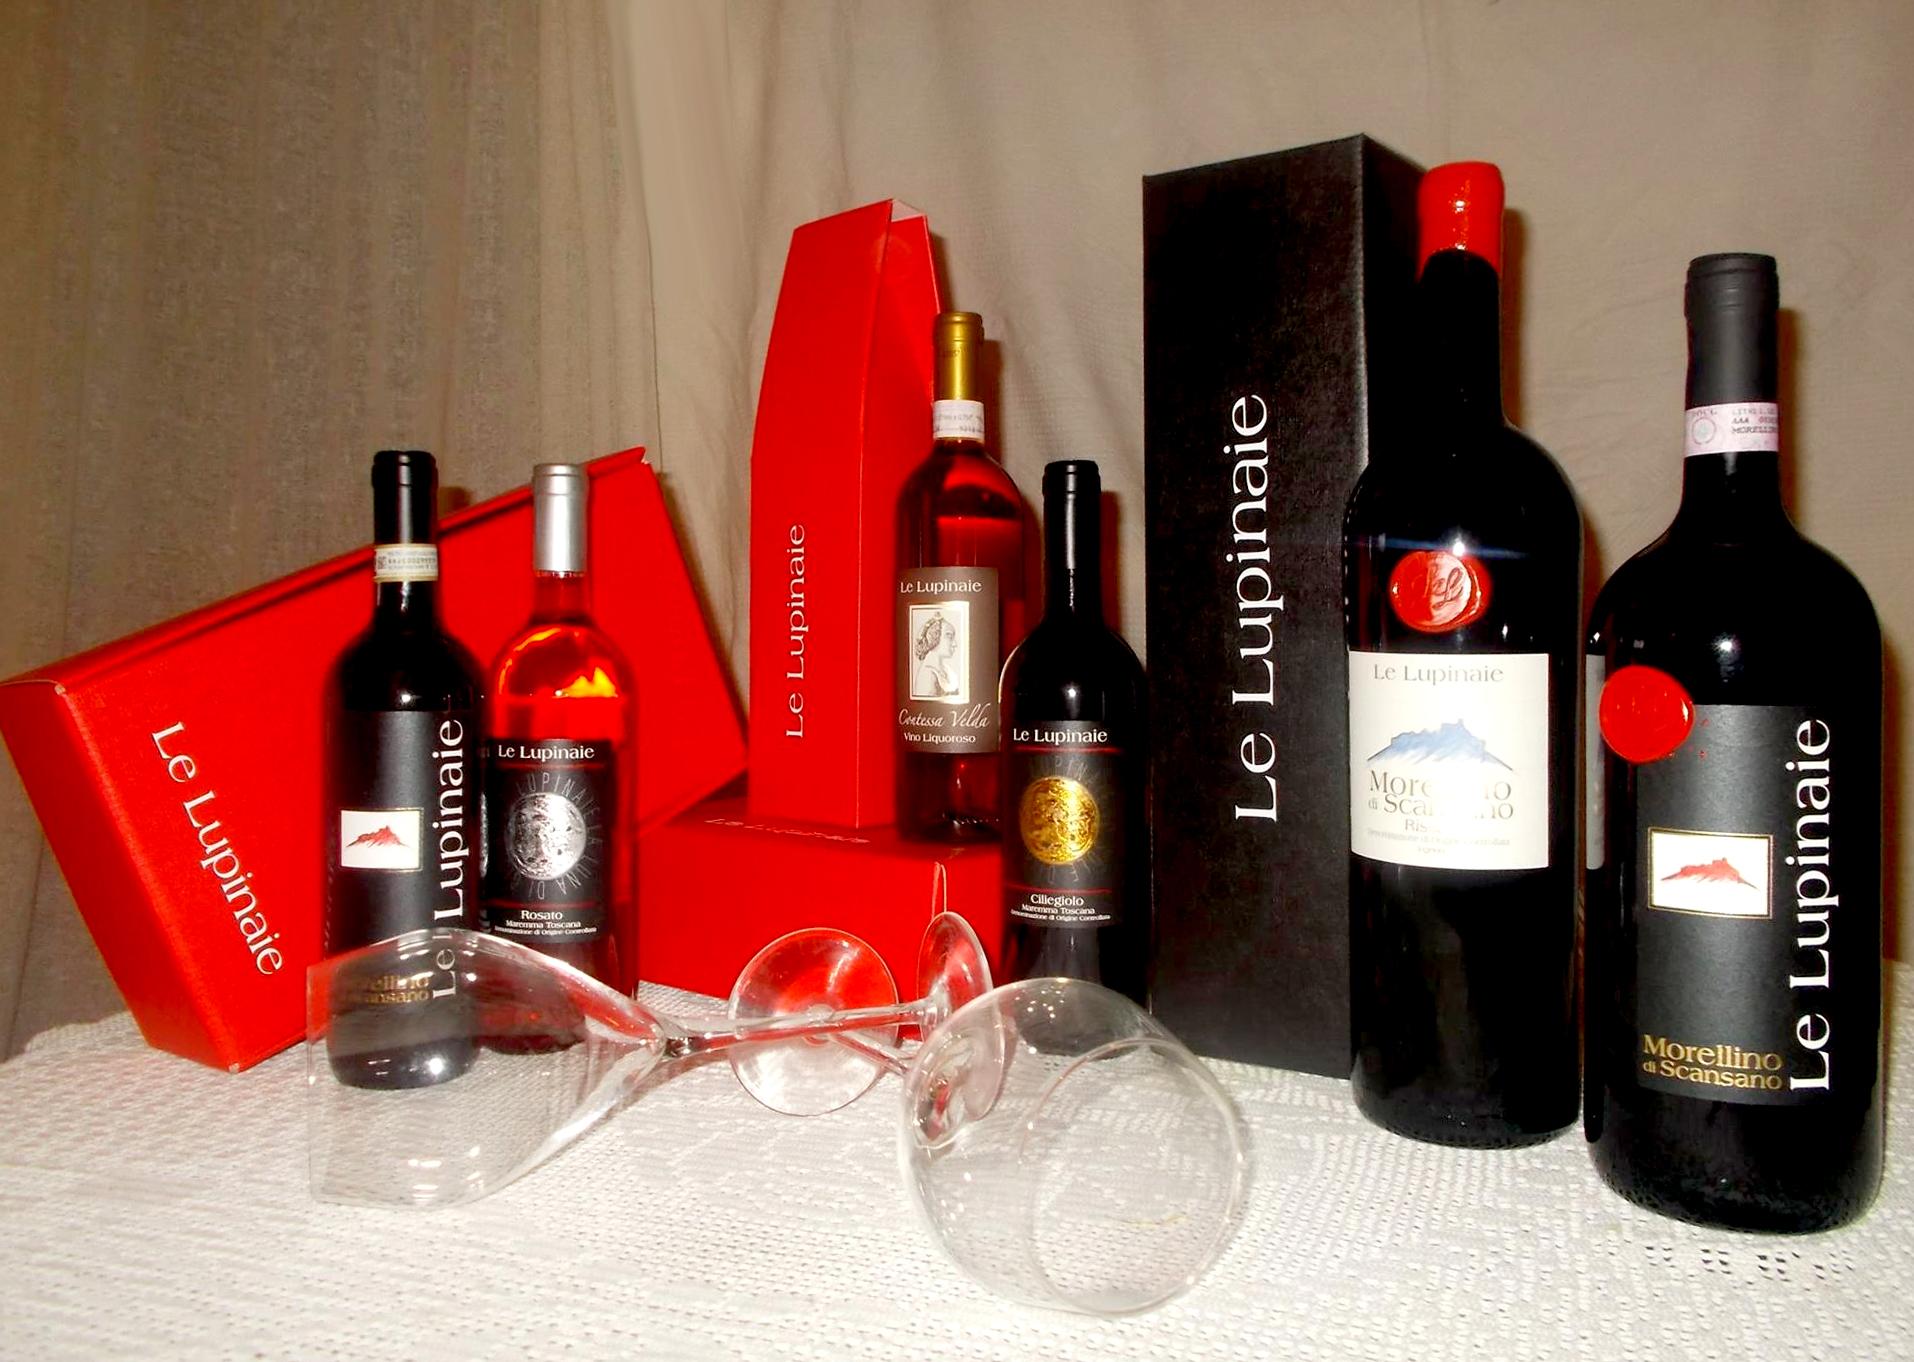 Prodotti Toscani Vino e Olio Le Lupinaie - Montiano Maremma Toscana